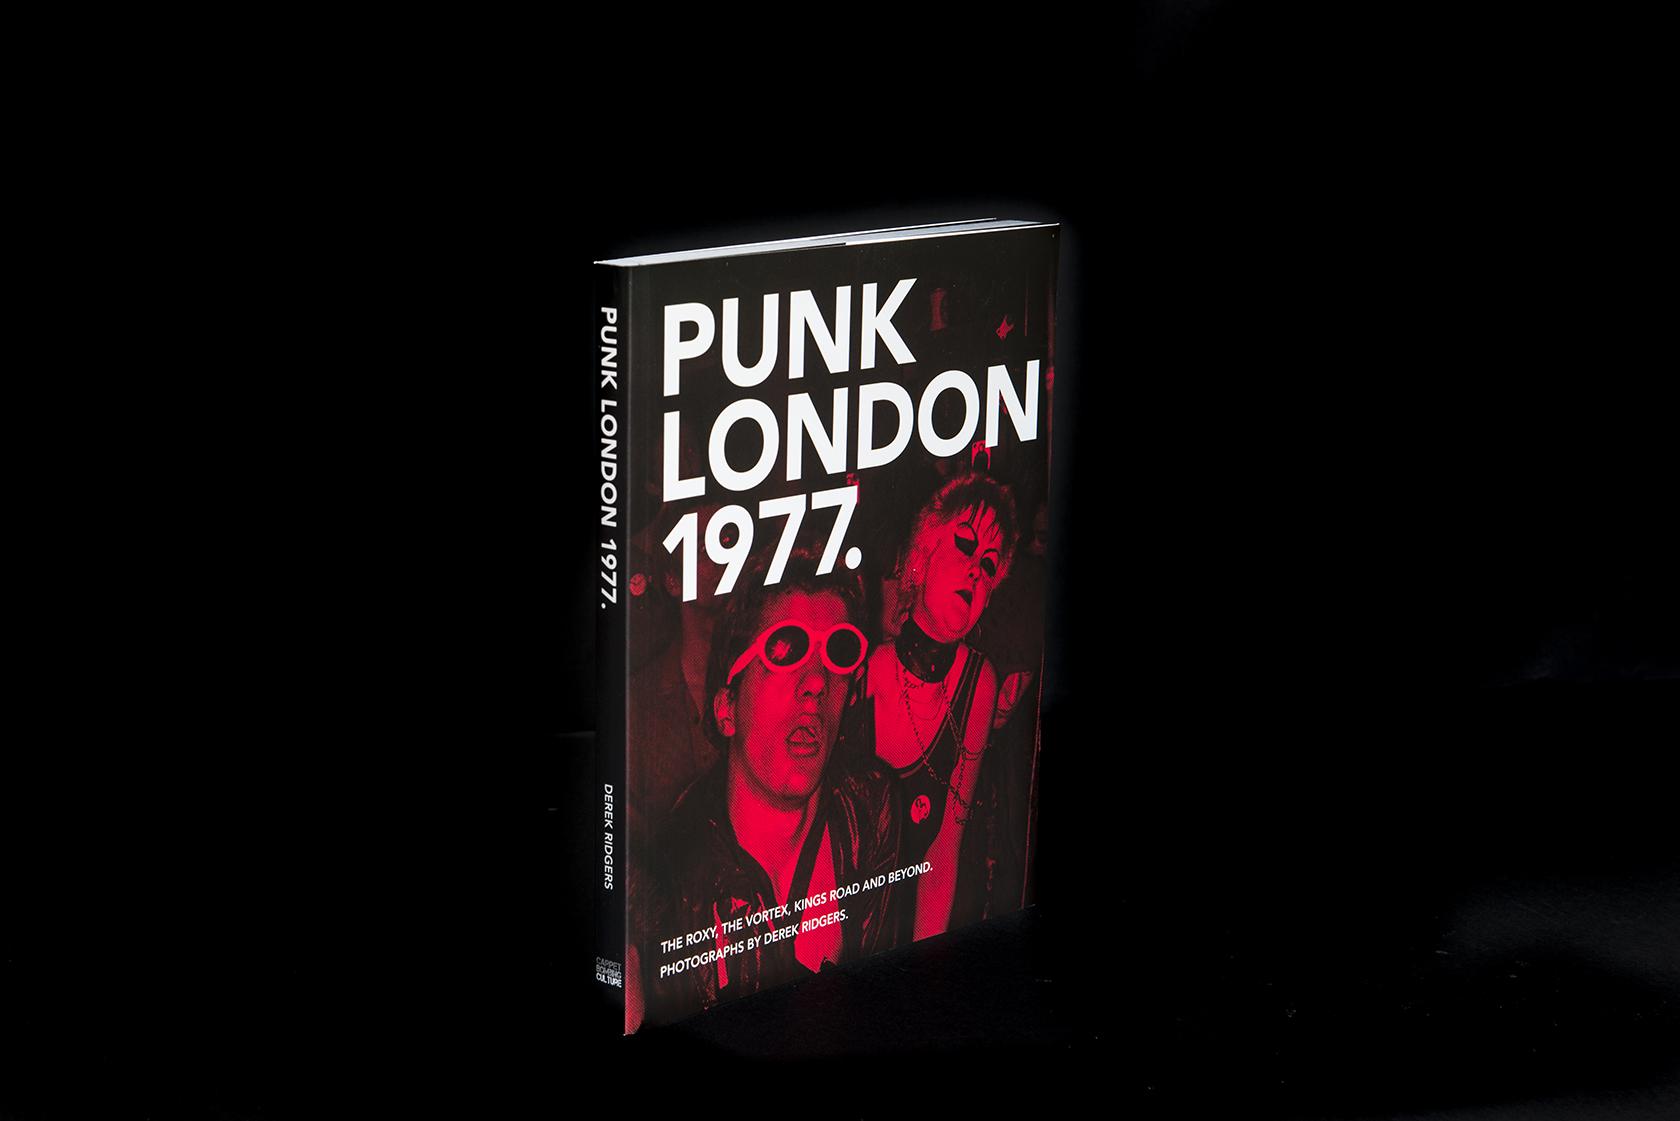 Punk London 1977